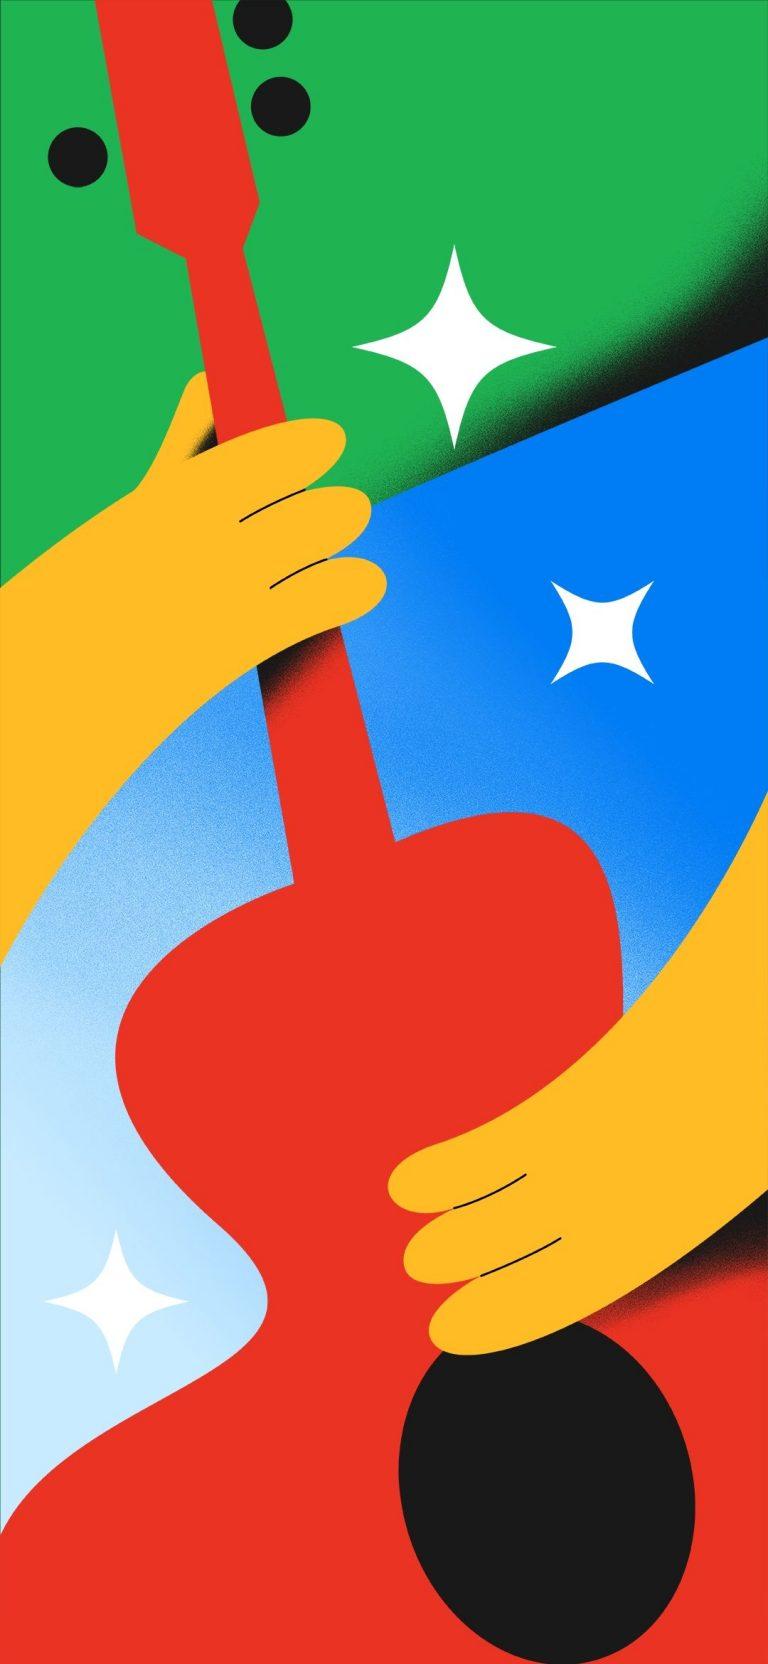 Google Pixel 4a Stock Wallpaper [1080x2340] - 04